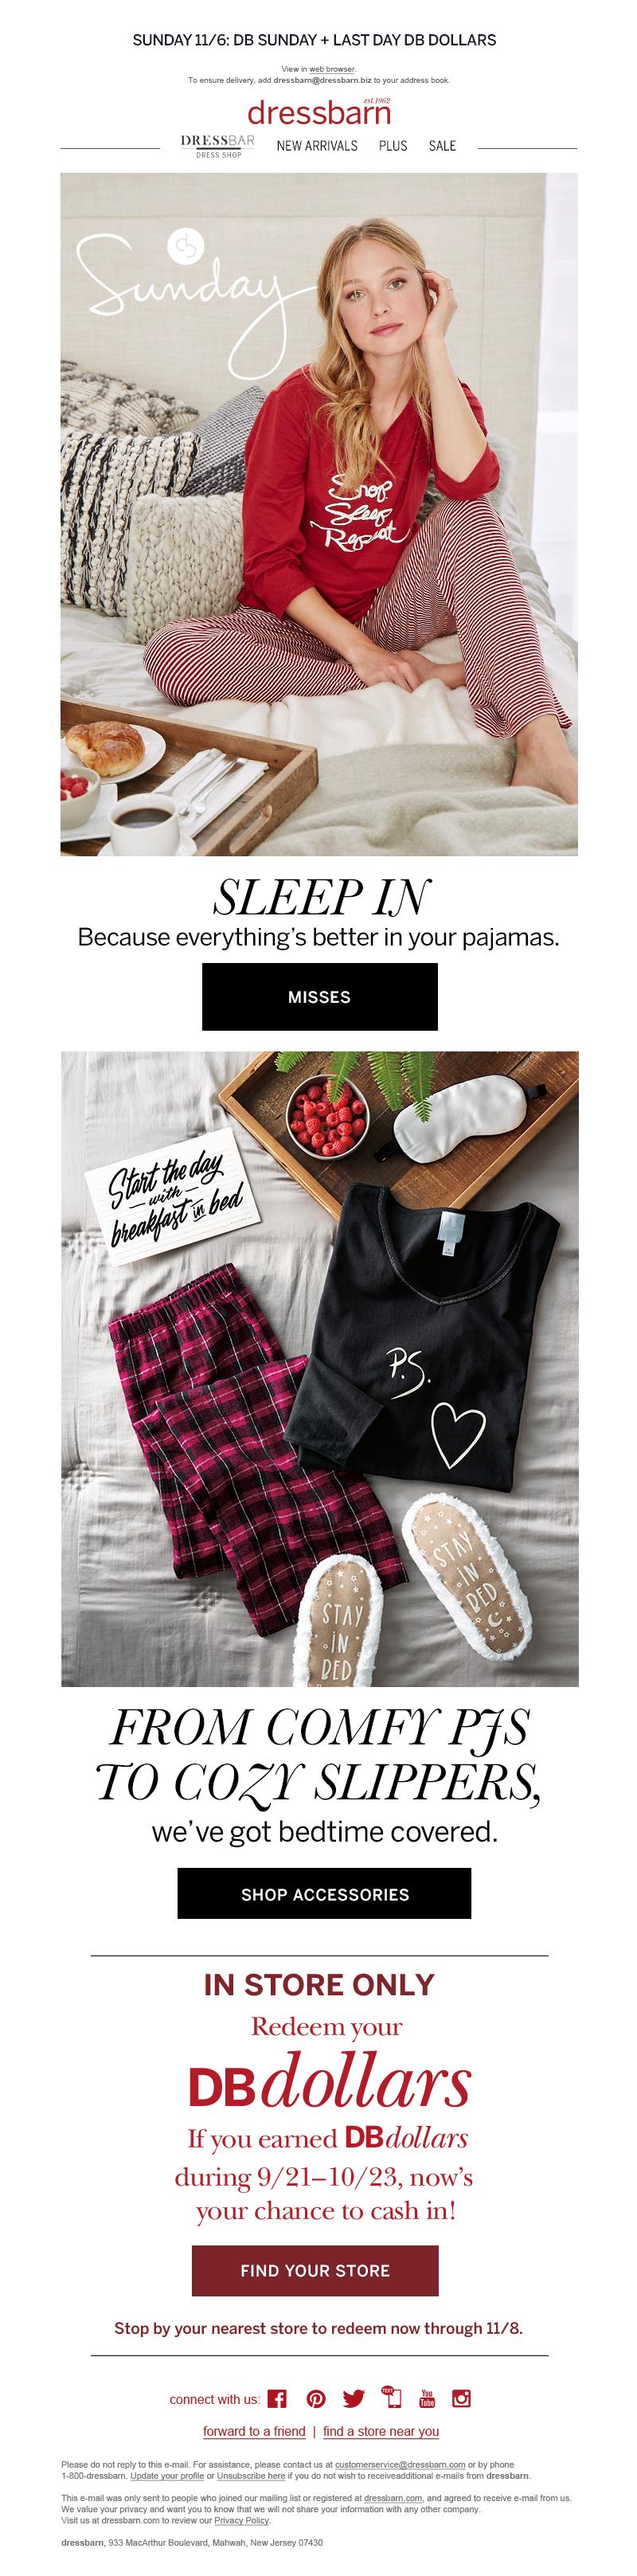 em20161106_Pajamas_M.jpg